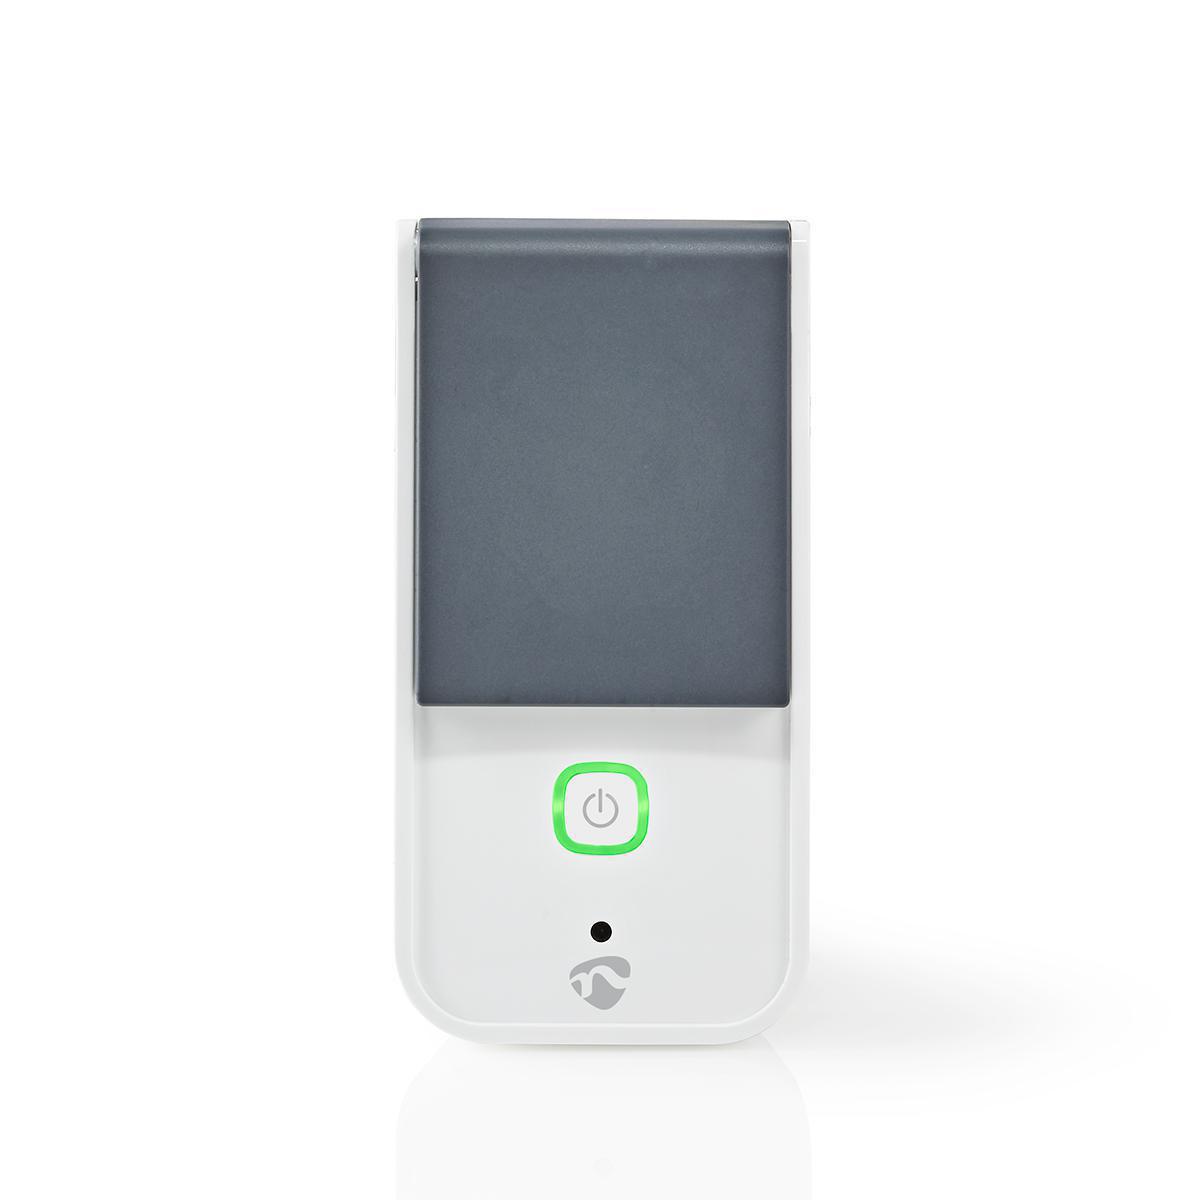 Wi-Fi Smart Plug para exteriores | Resistente a salpicaduras | IP44 | Monitor de consumo | Schuko Type F | 16 A